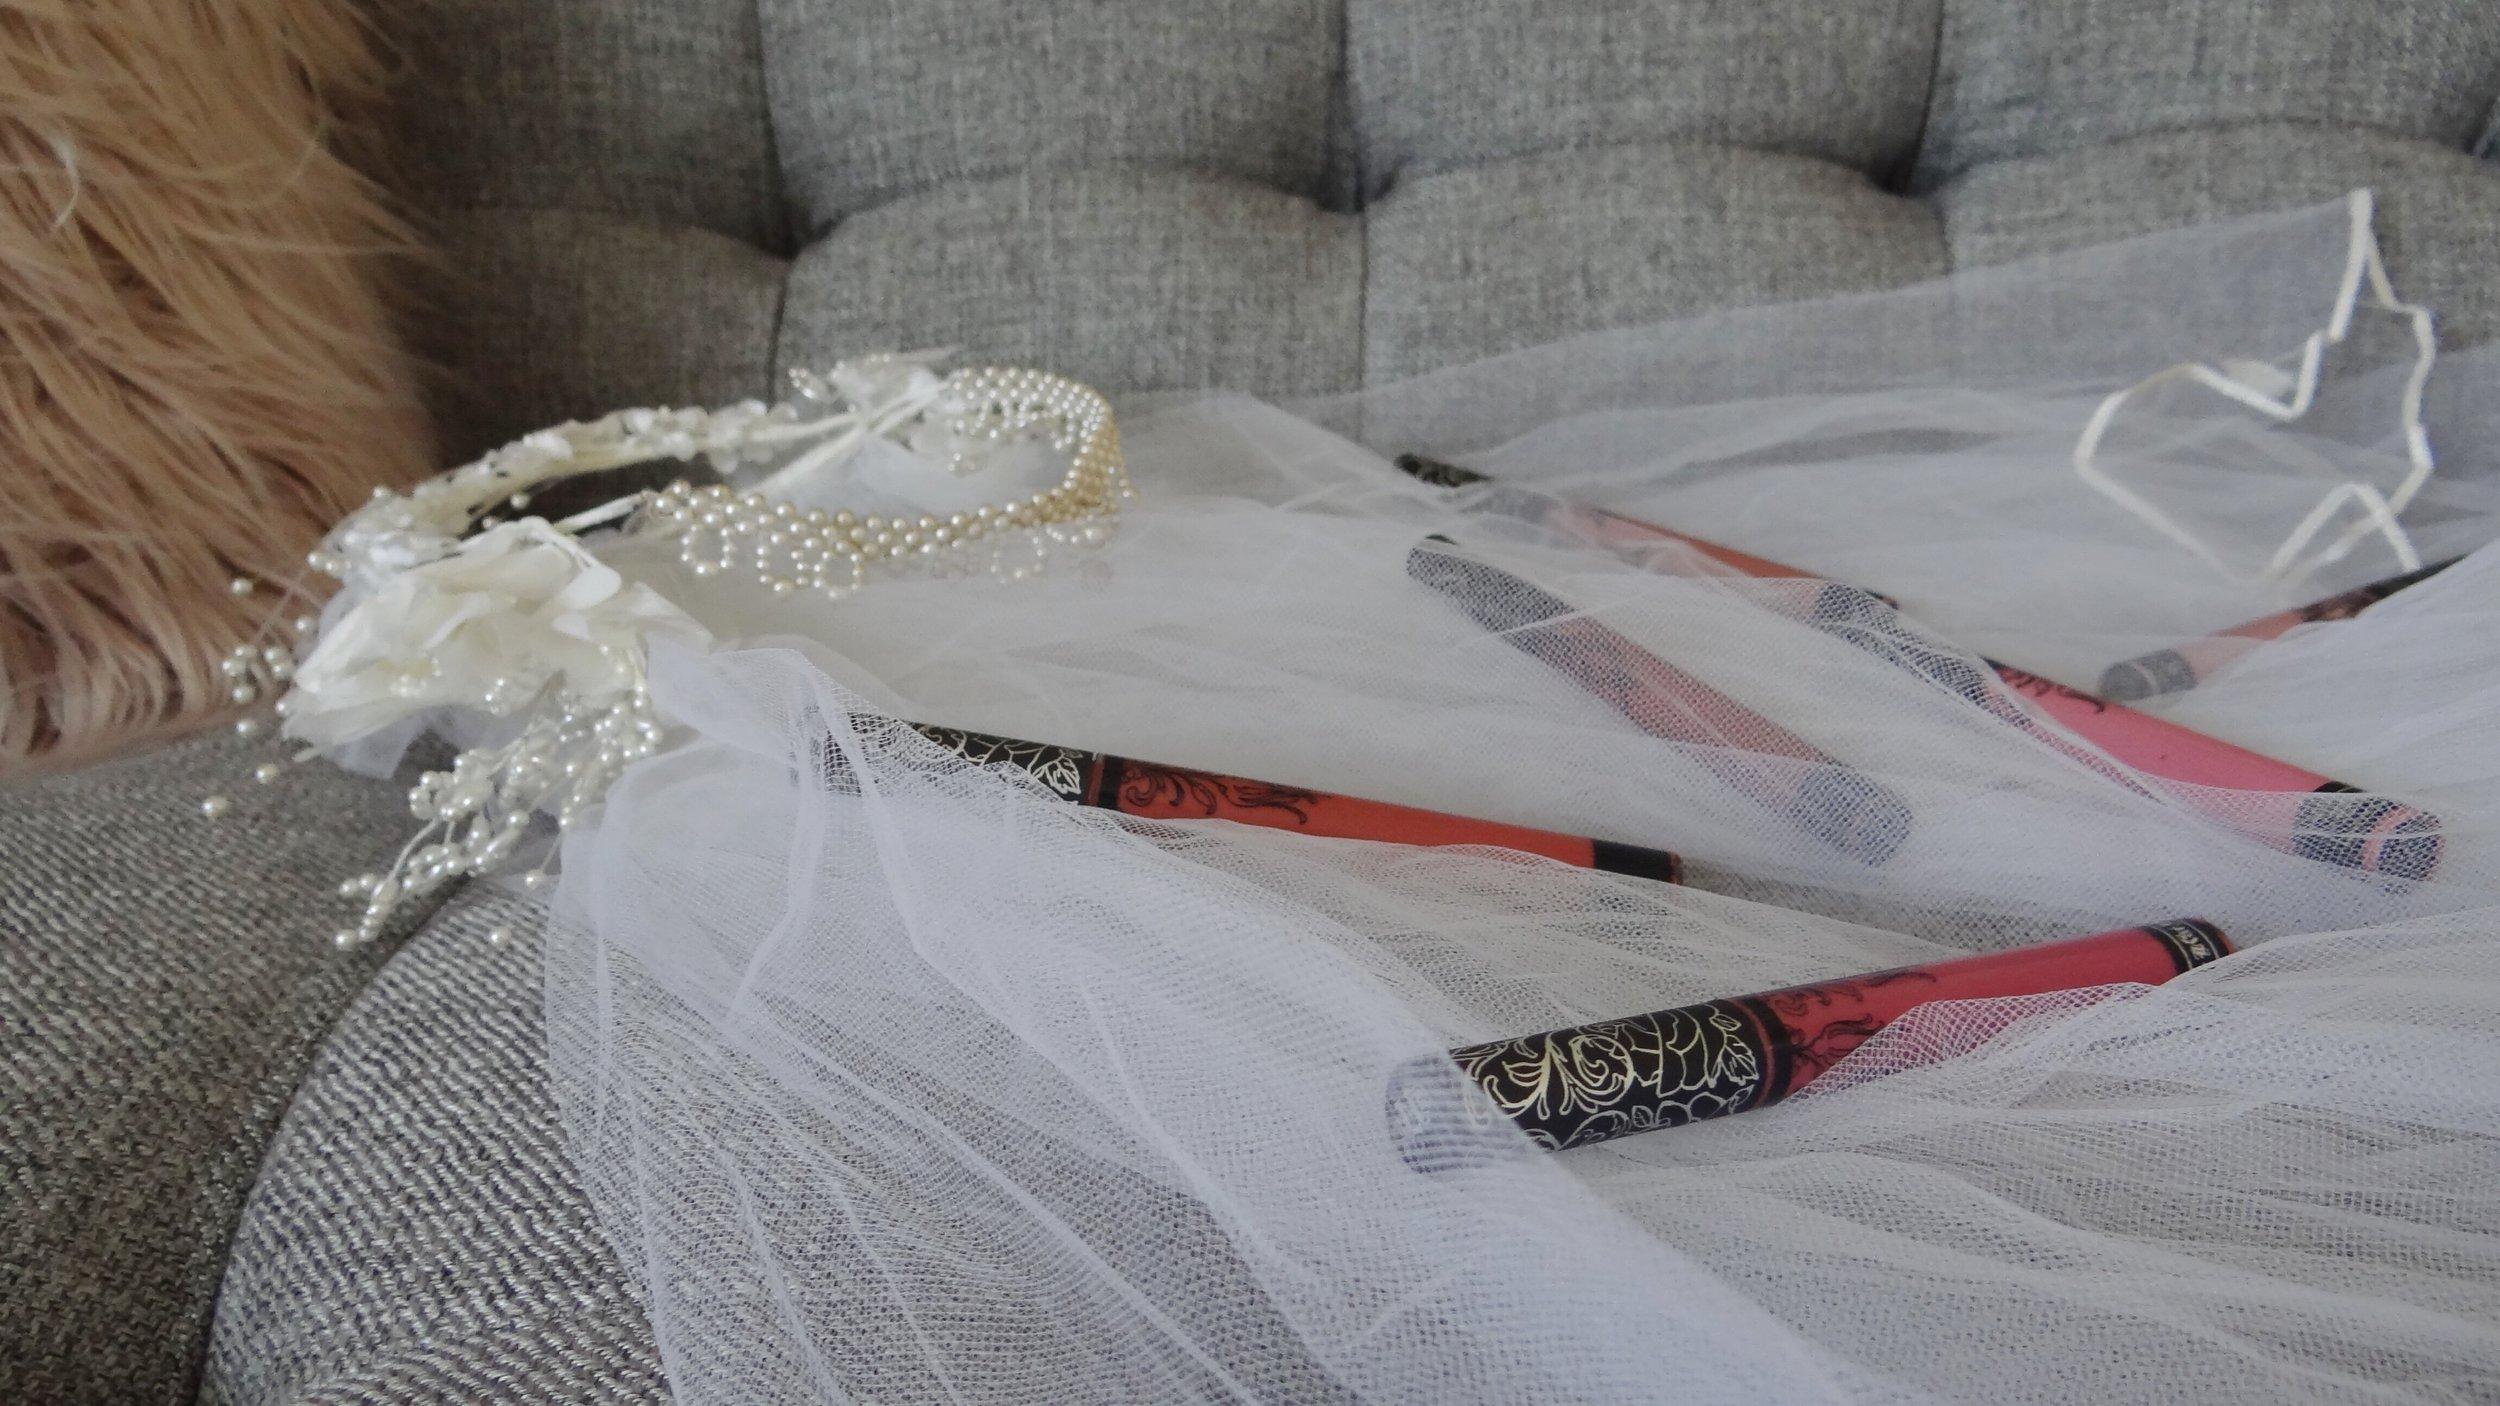 5 Essentials for Long-Wearing Bridal Makeup (Perfect for Destination Weddings & Elopements!) - Artistry by Jacquie, Ottawa Makeup Artist (Kat Von D Beauty)